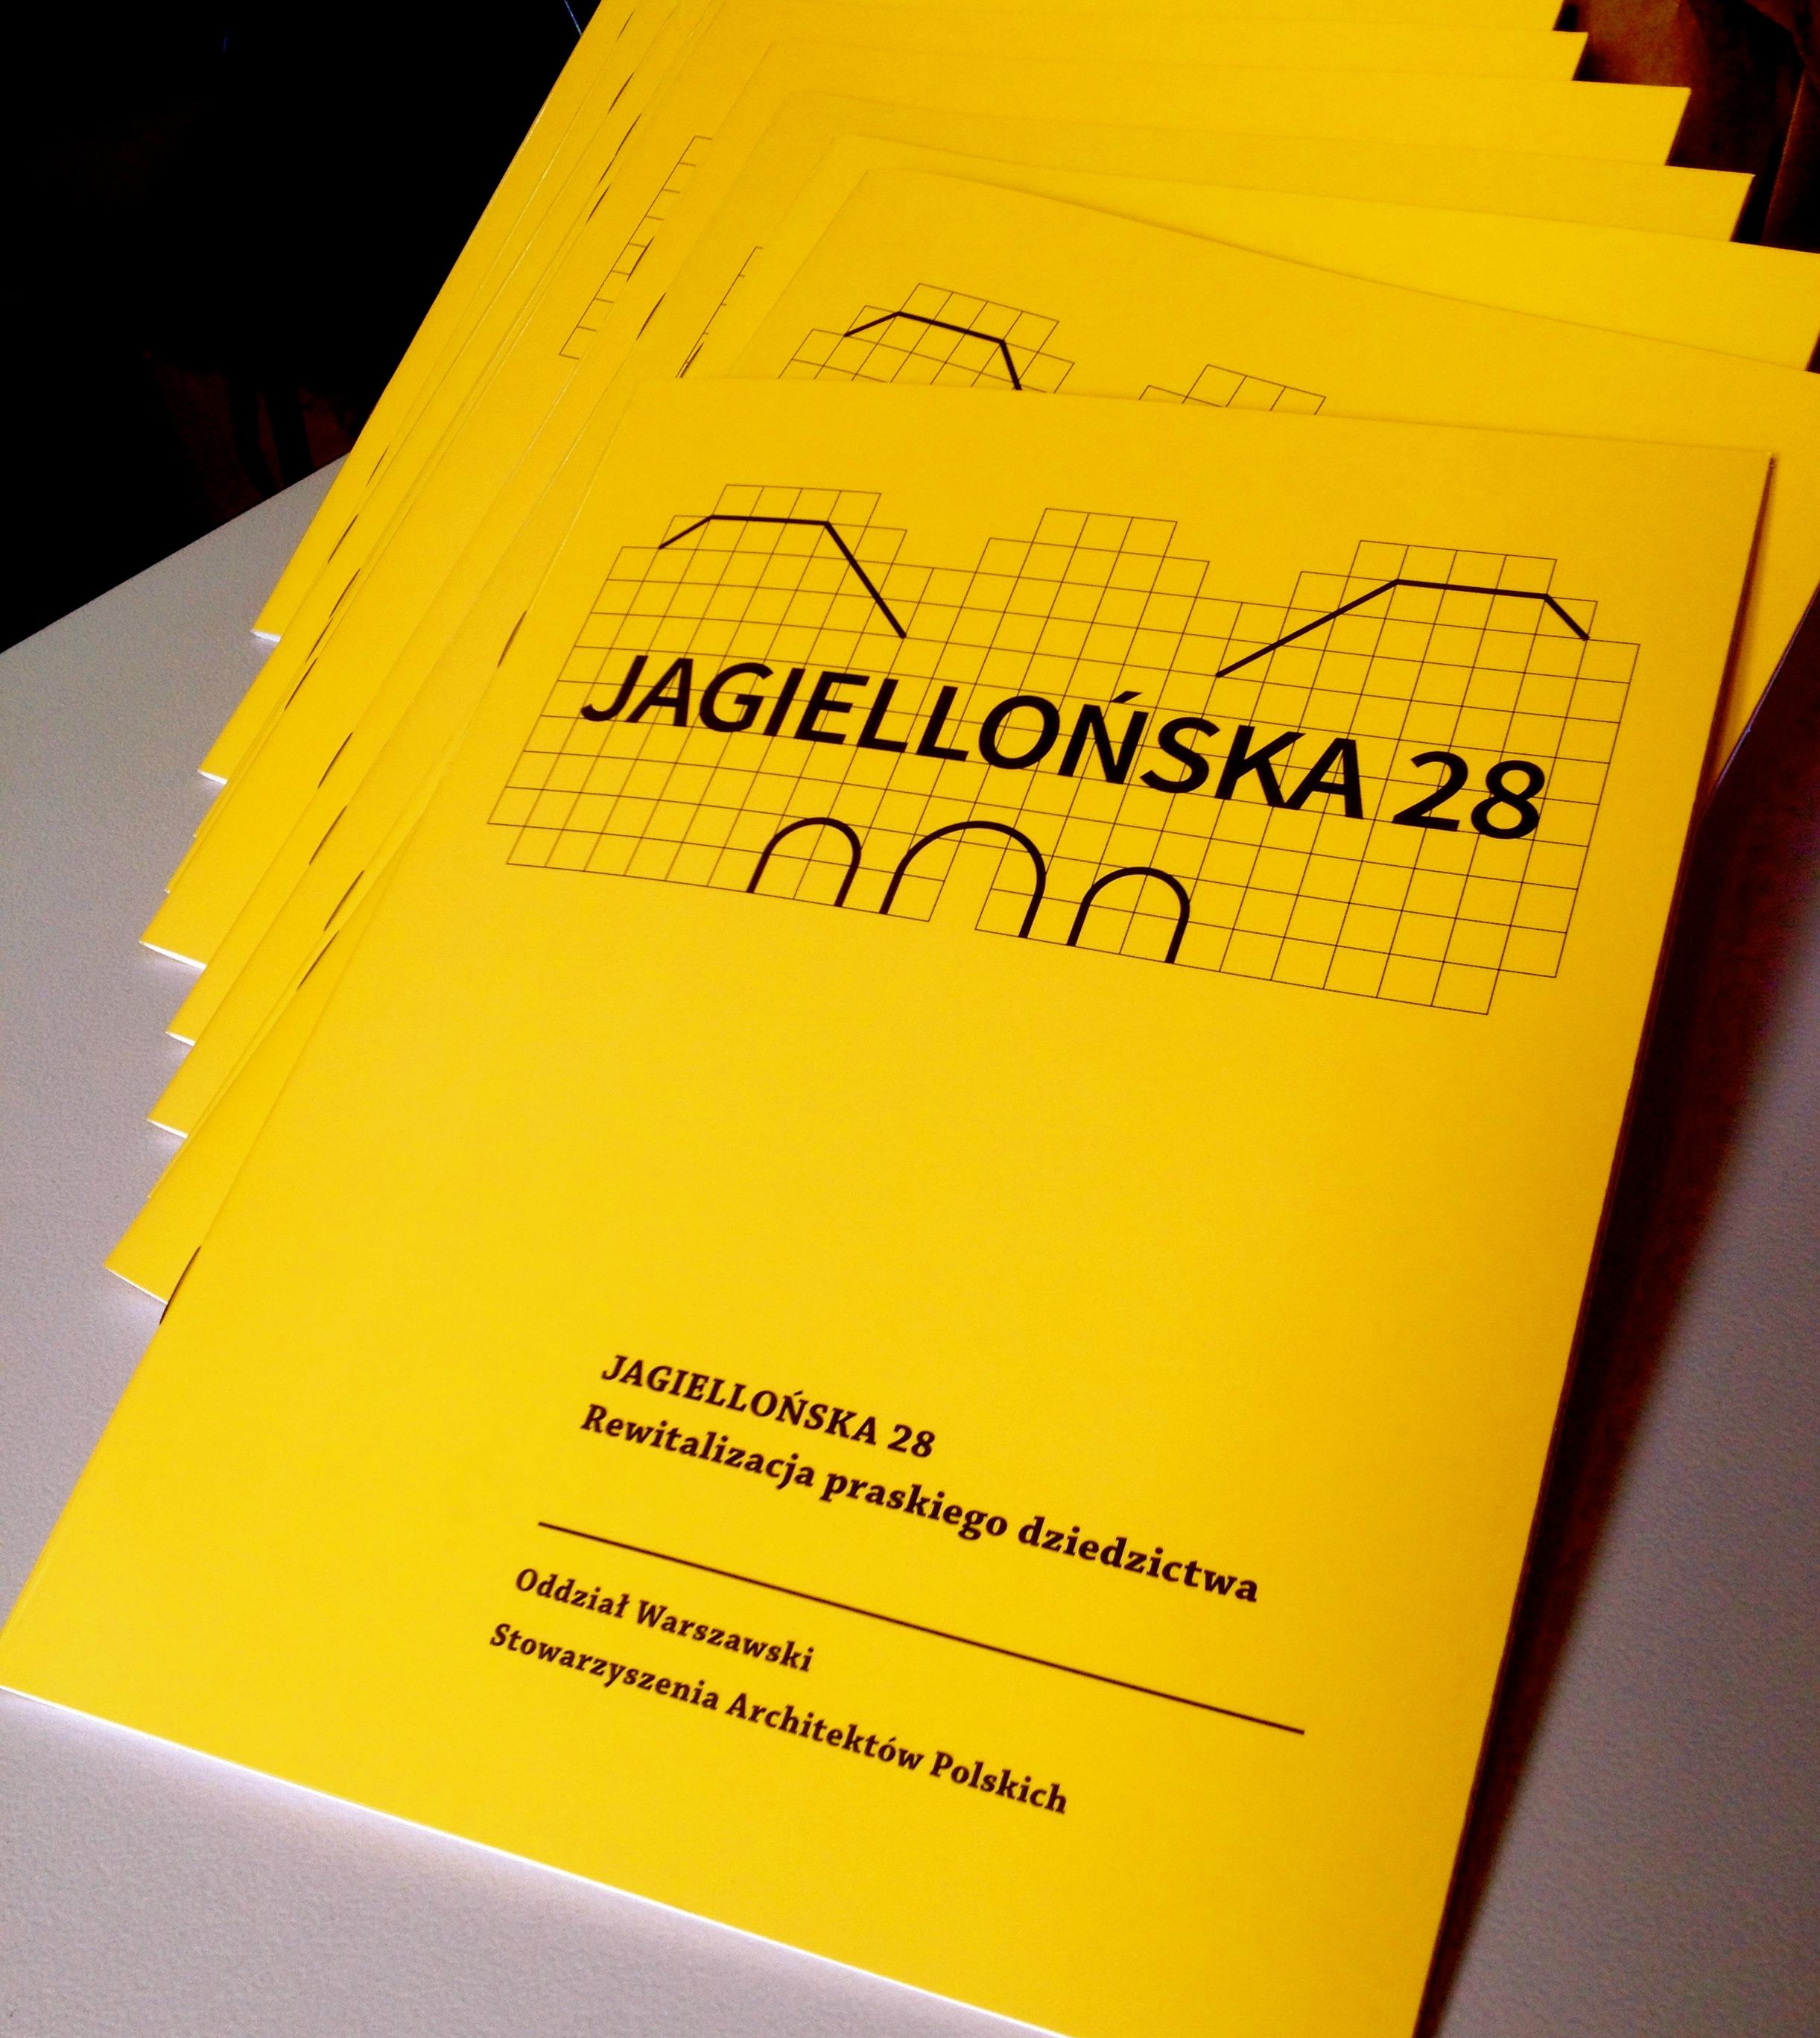 okladka_Jagiellonska28